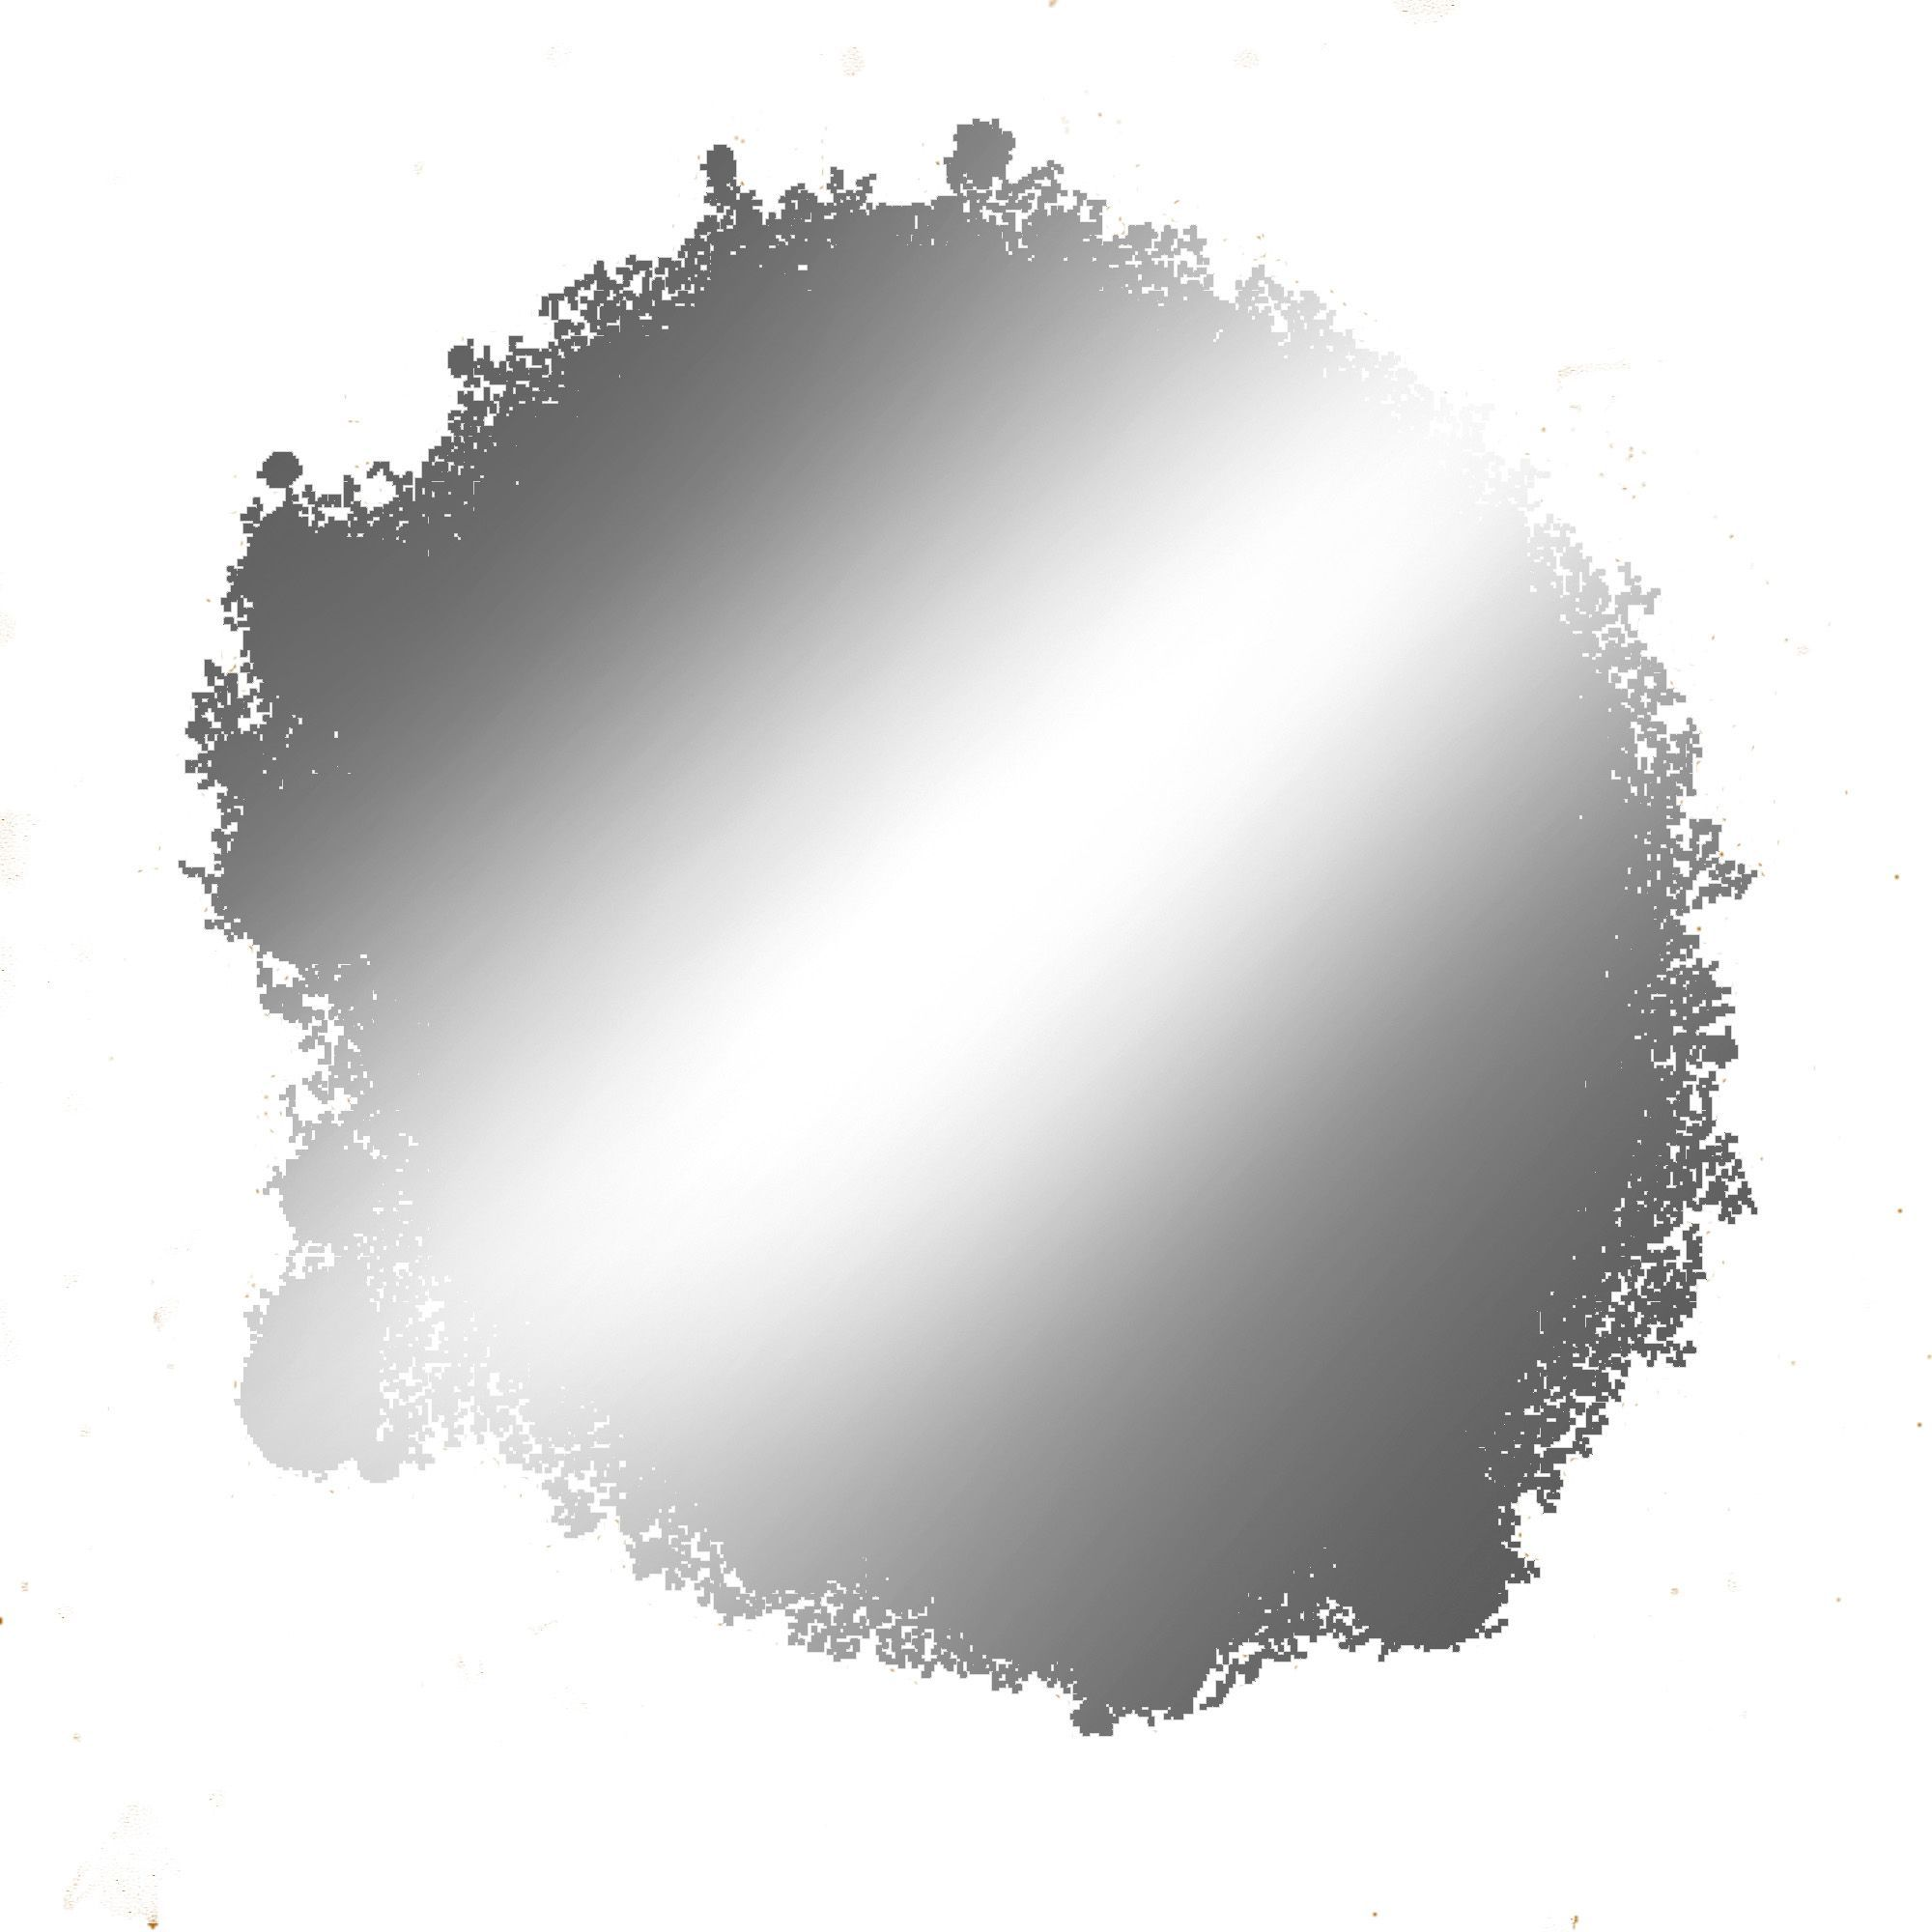 Plasti Kote Silver Gloss Enamel Spray Paint 100 Ml Rooms